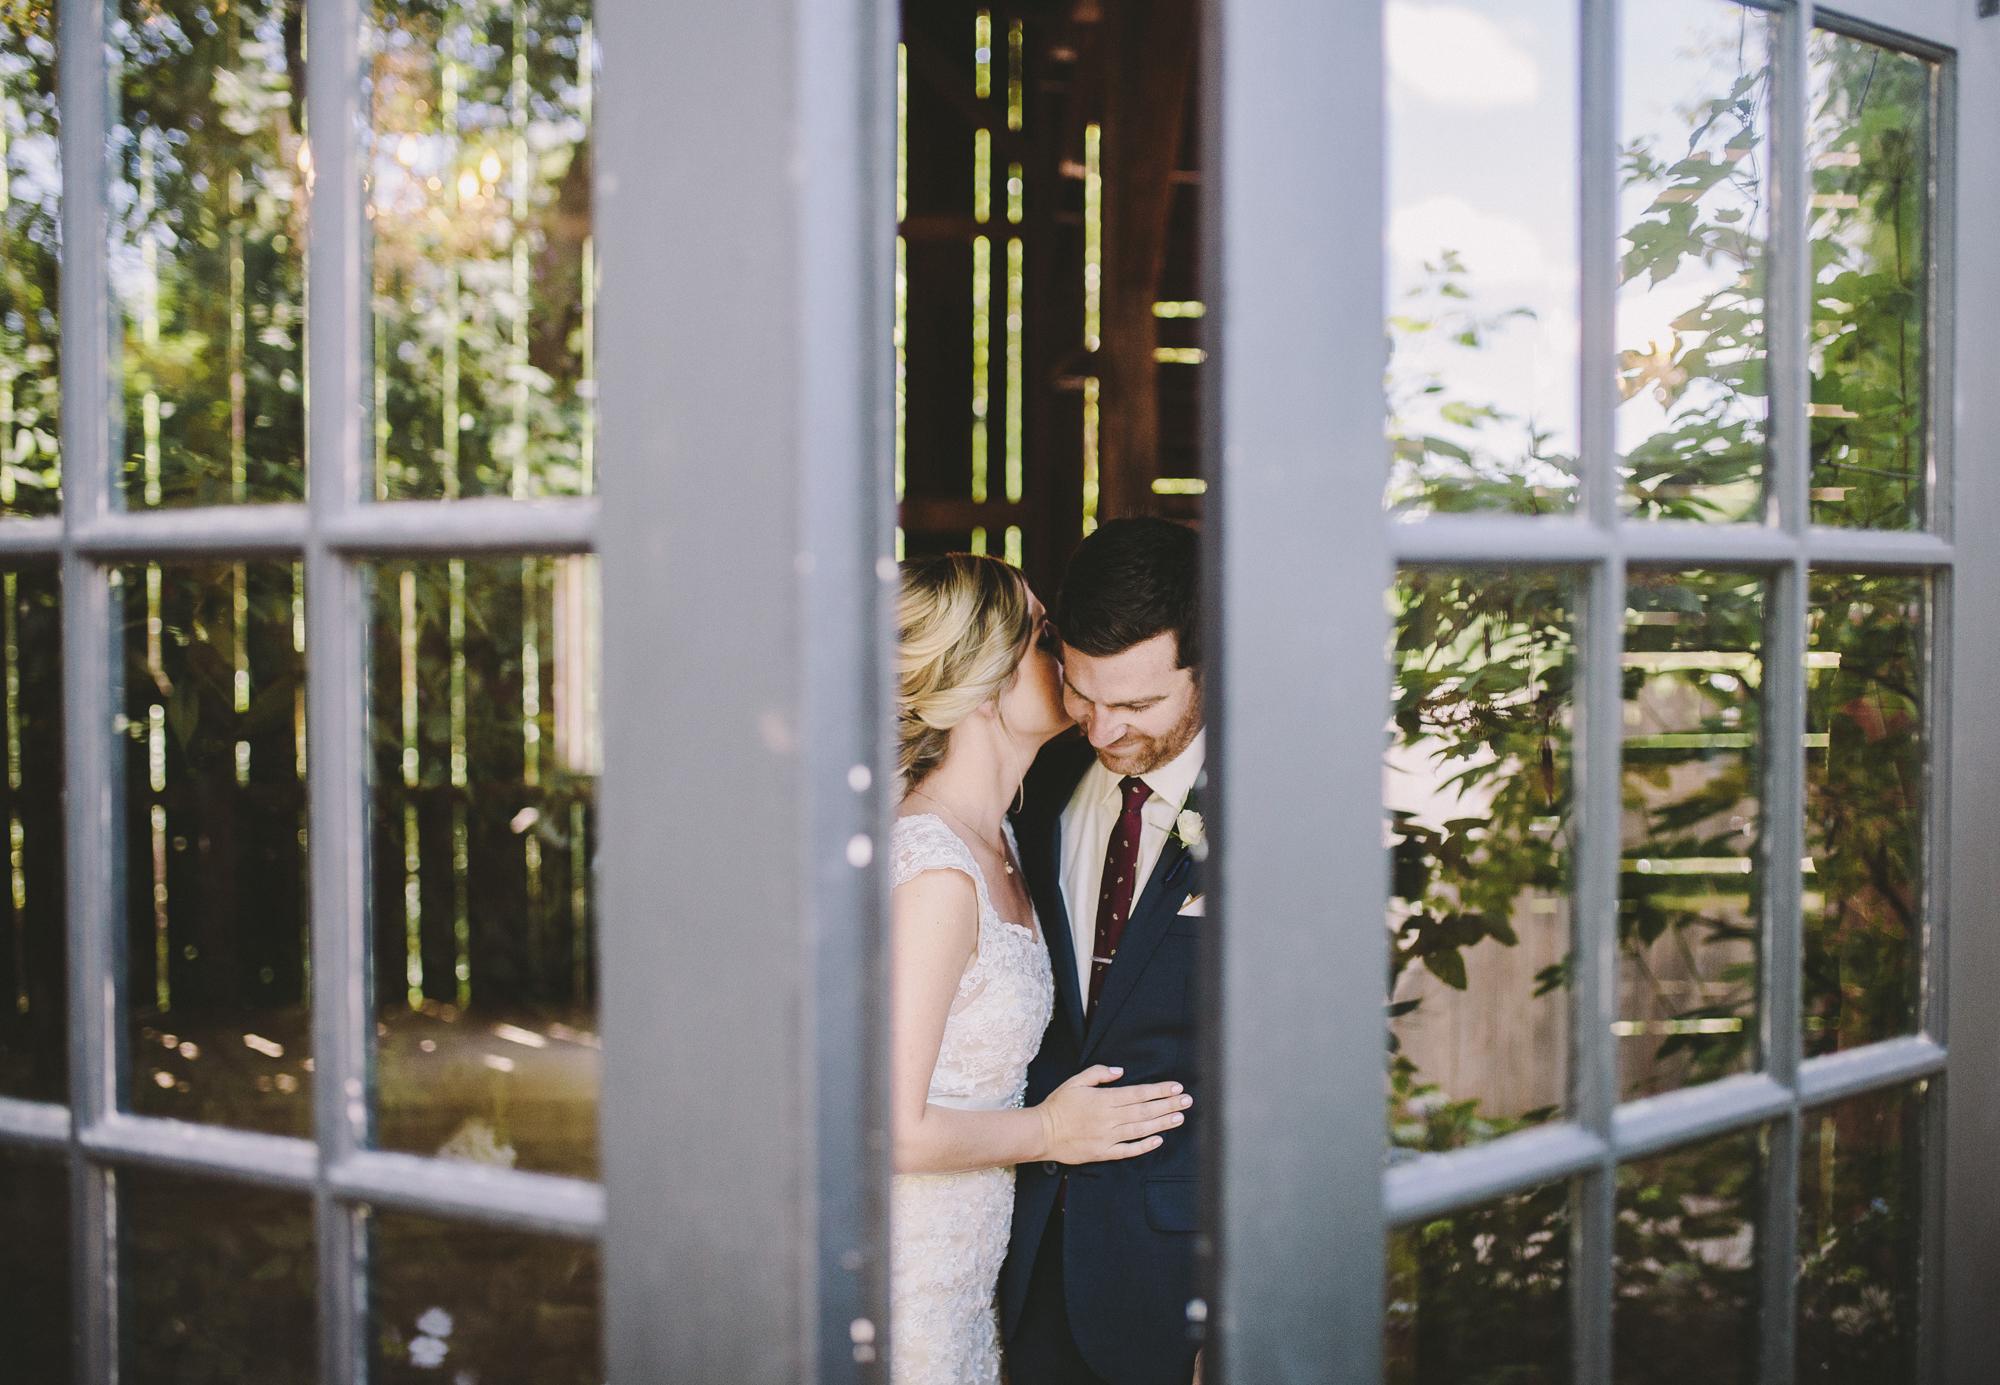 Brandon werth minnesota wedding photographer camrose hill flower farm stillwater